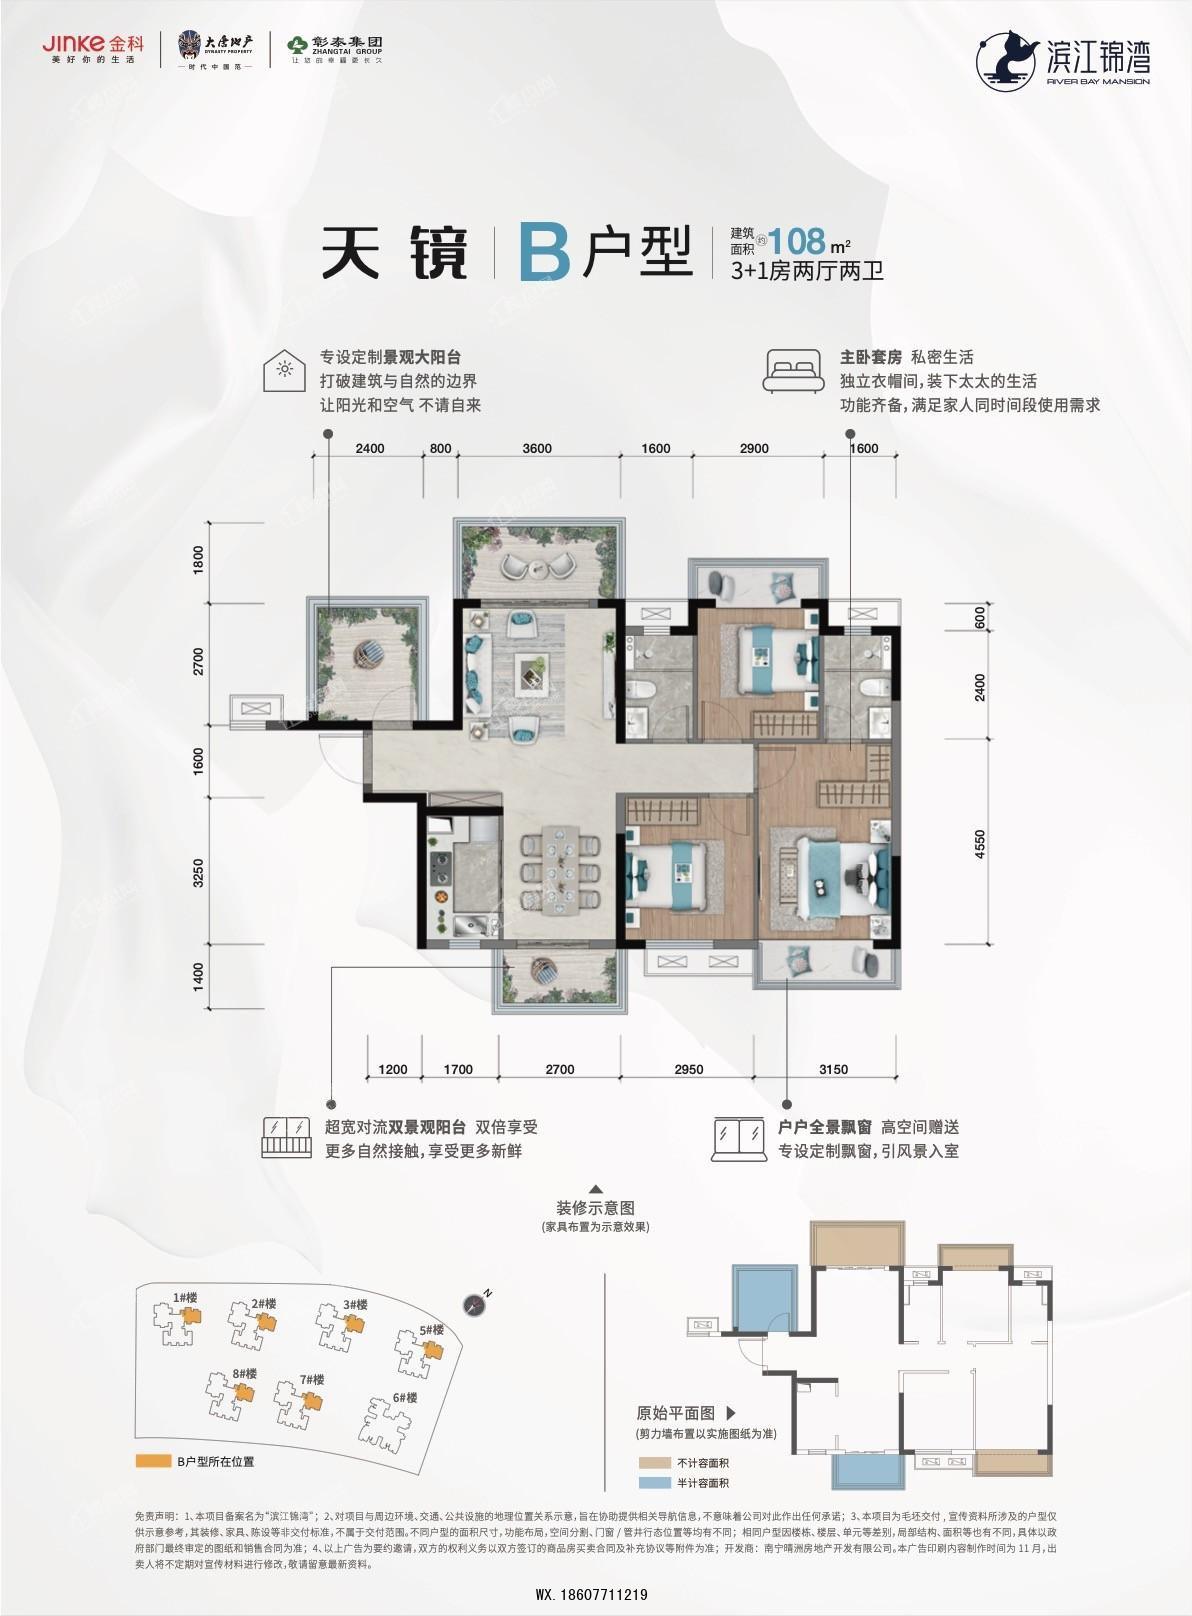 b滨江锦湾户型